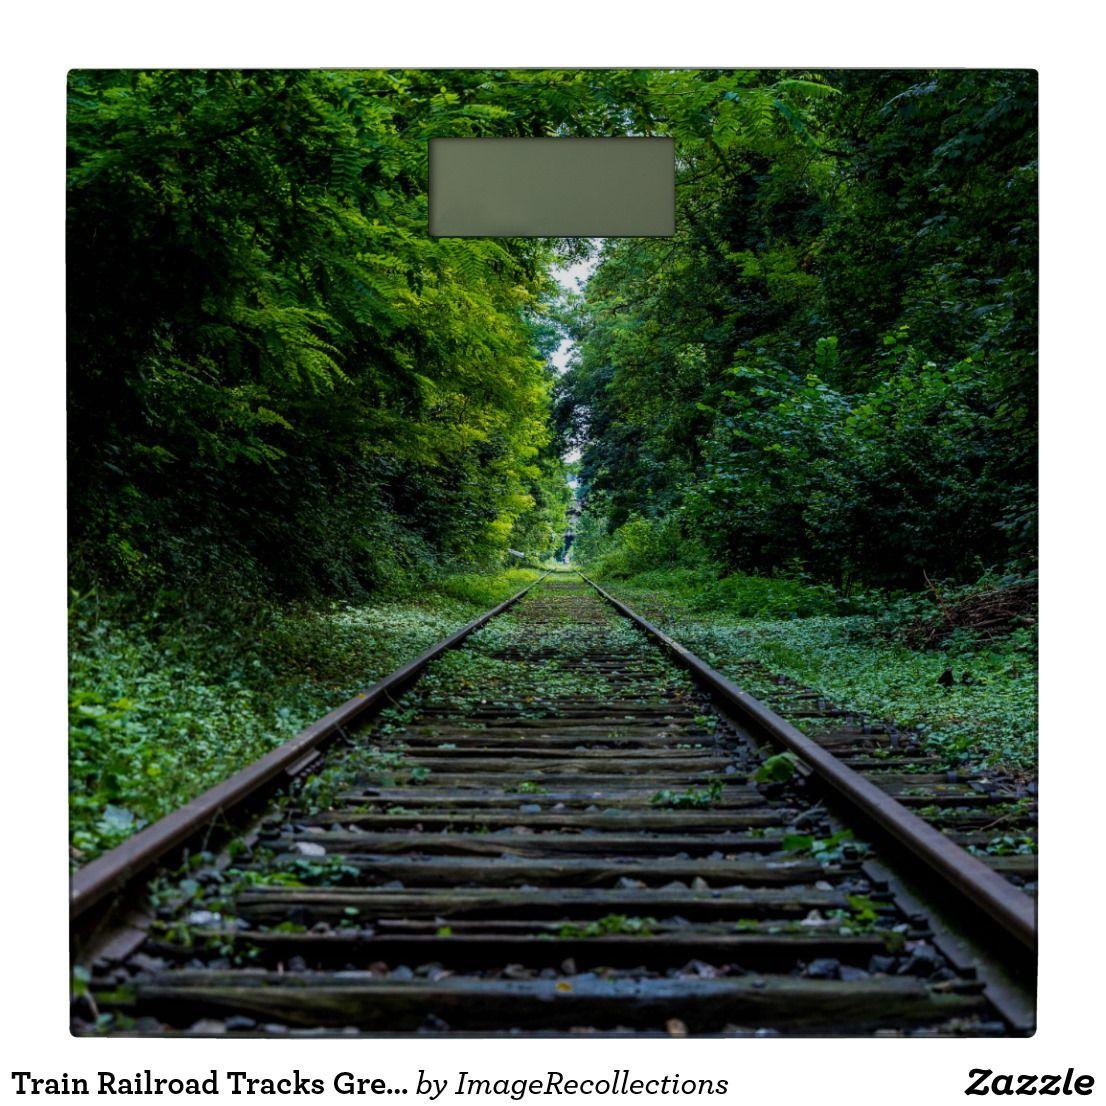 Train Railroad Tracks Green Woods Bathroom Scale | Zazzle.com